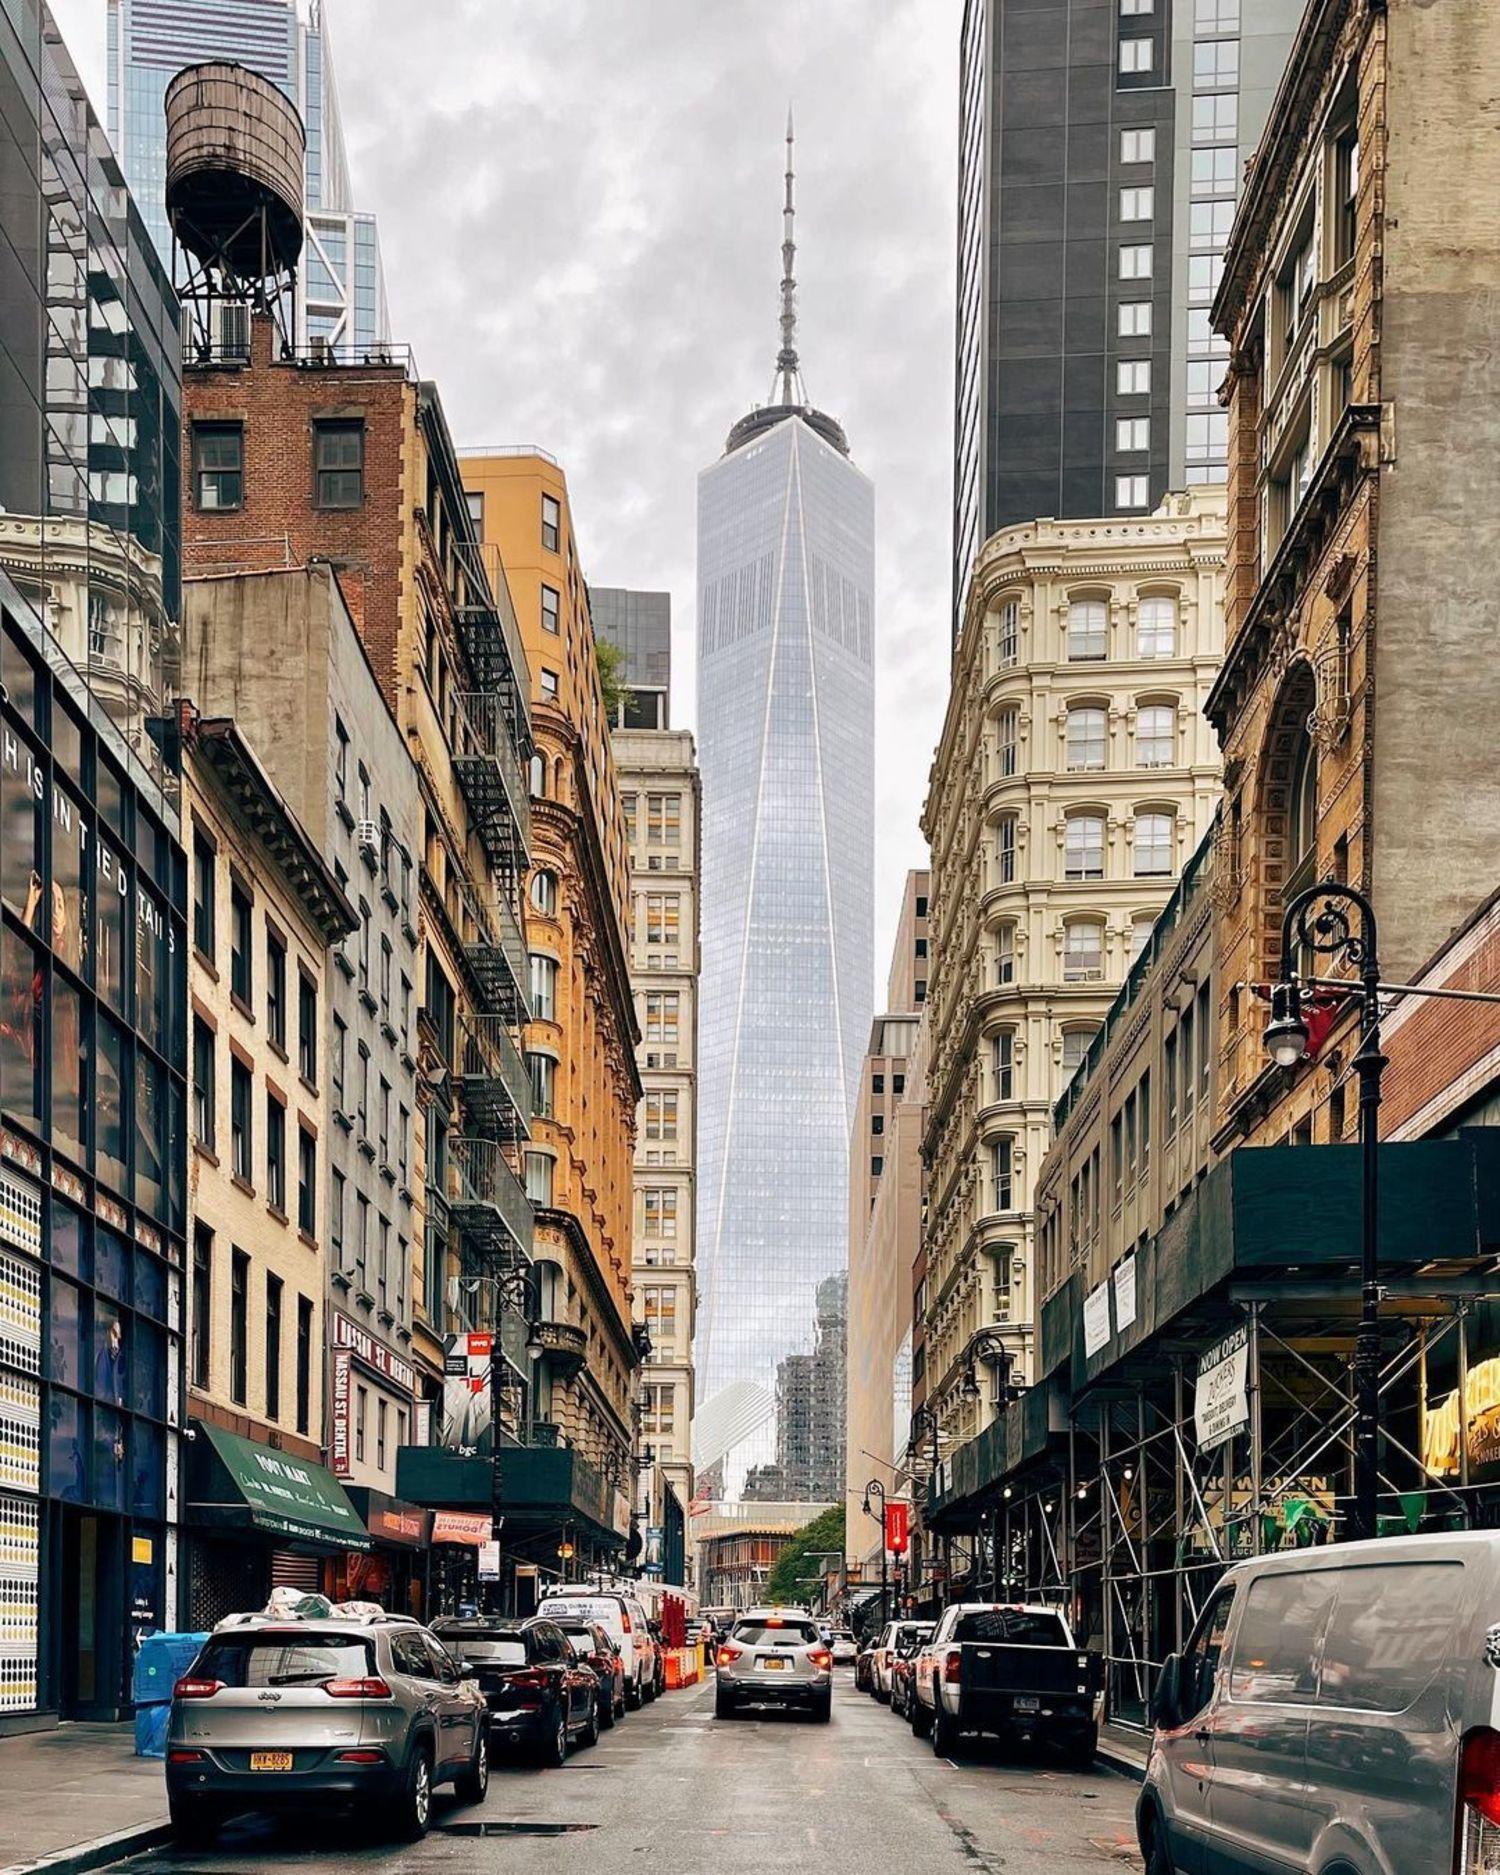 Looking down Fulton Street towards One World Trade Center, Financial District, Manhattan